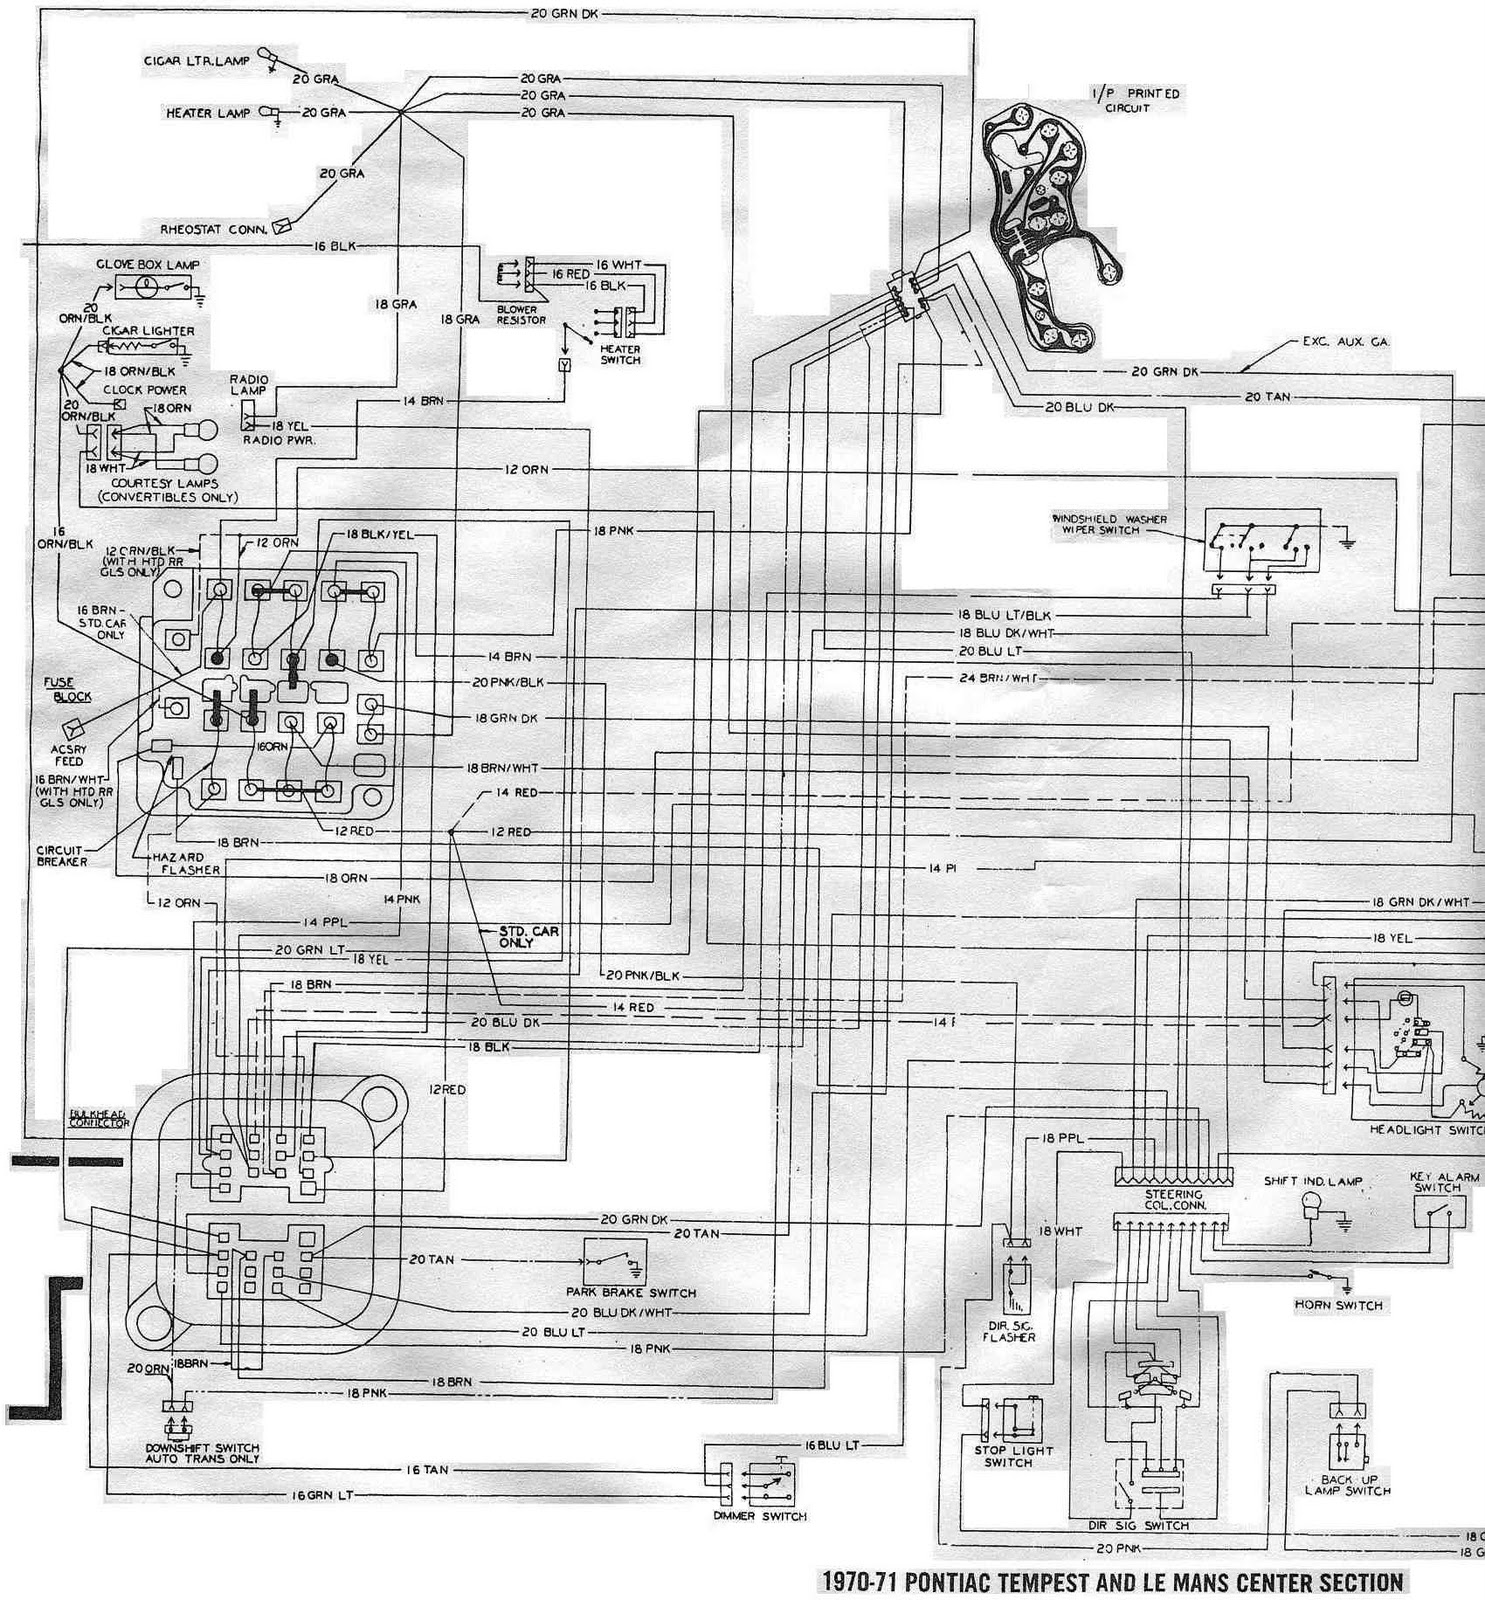 1968 Dodge Coro Wiring Diagram Improve Schematic Explained Diagrams Rh Dmdelectro Co